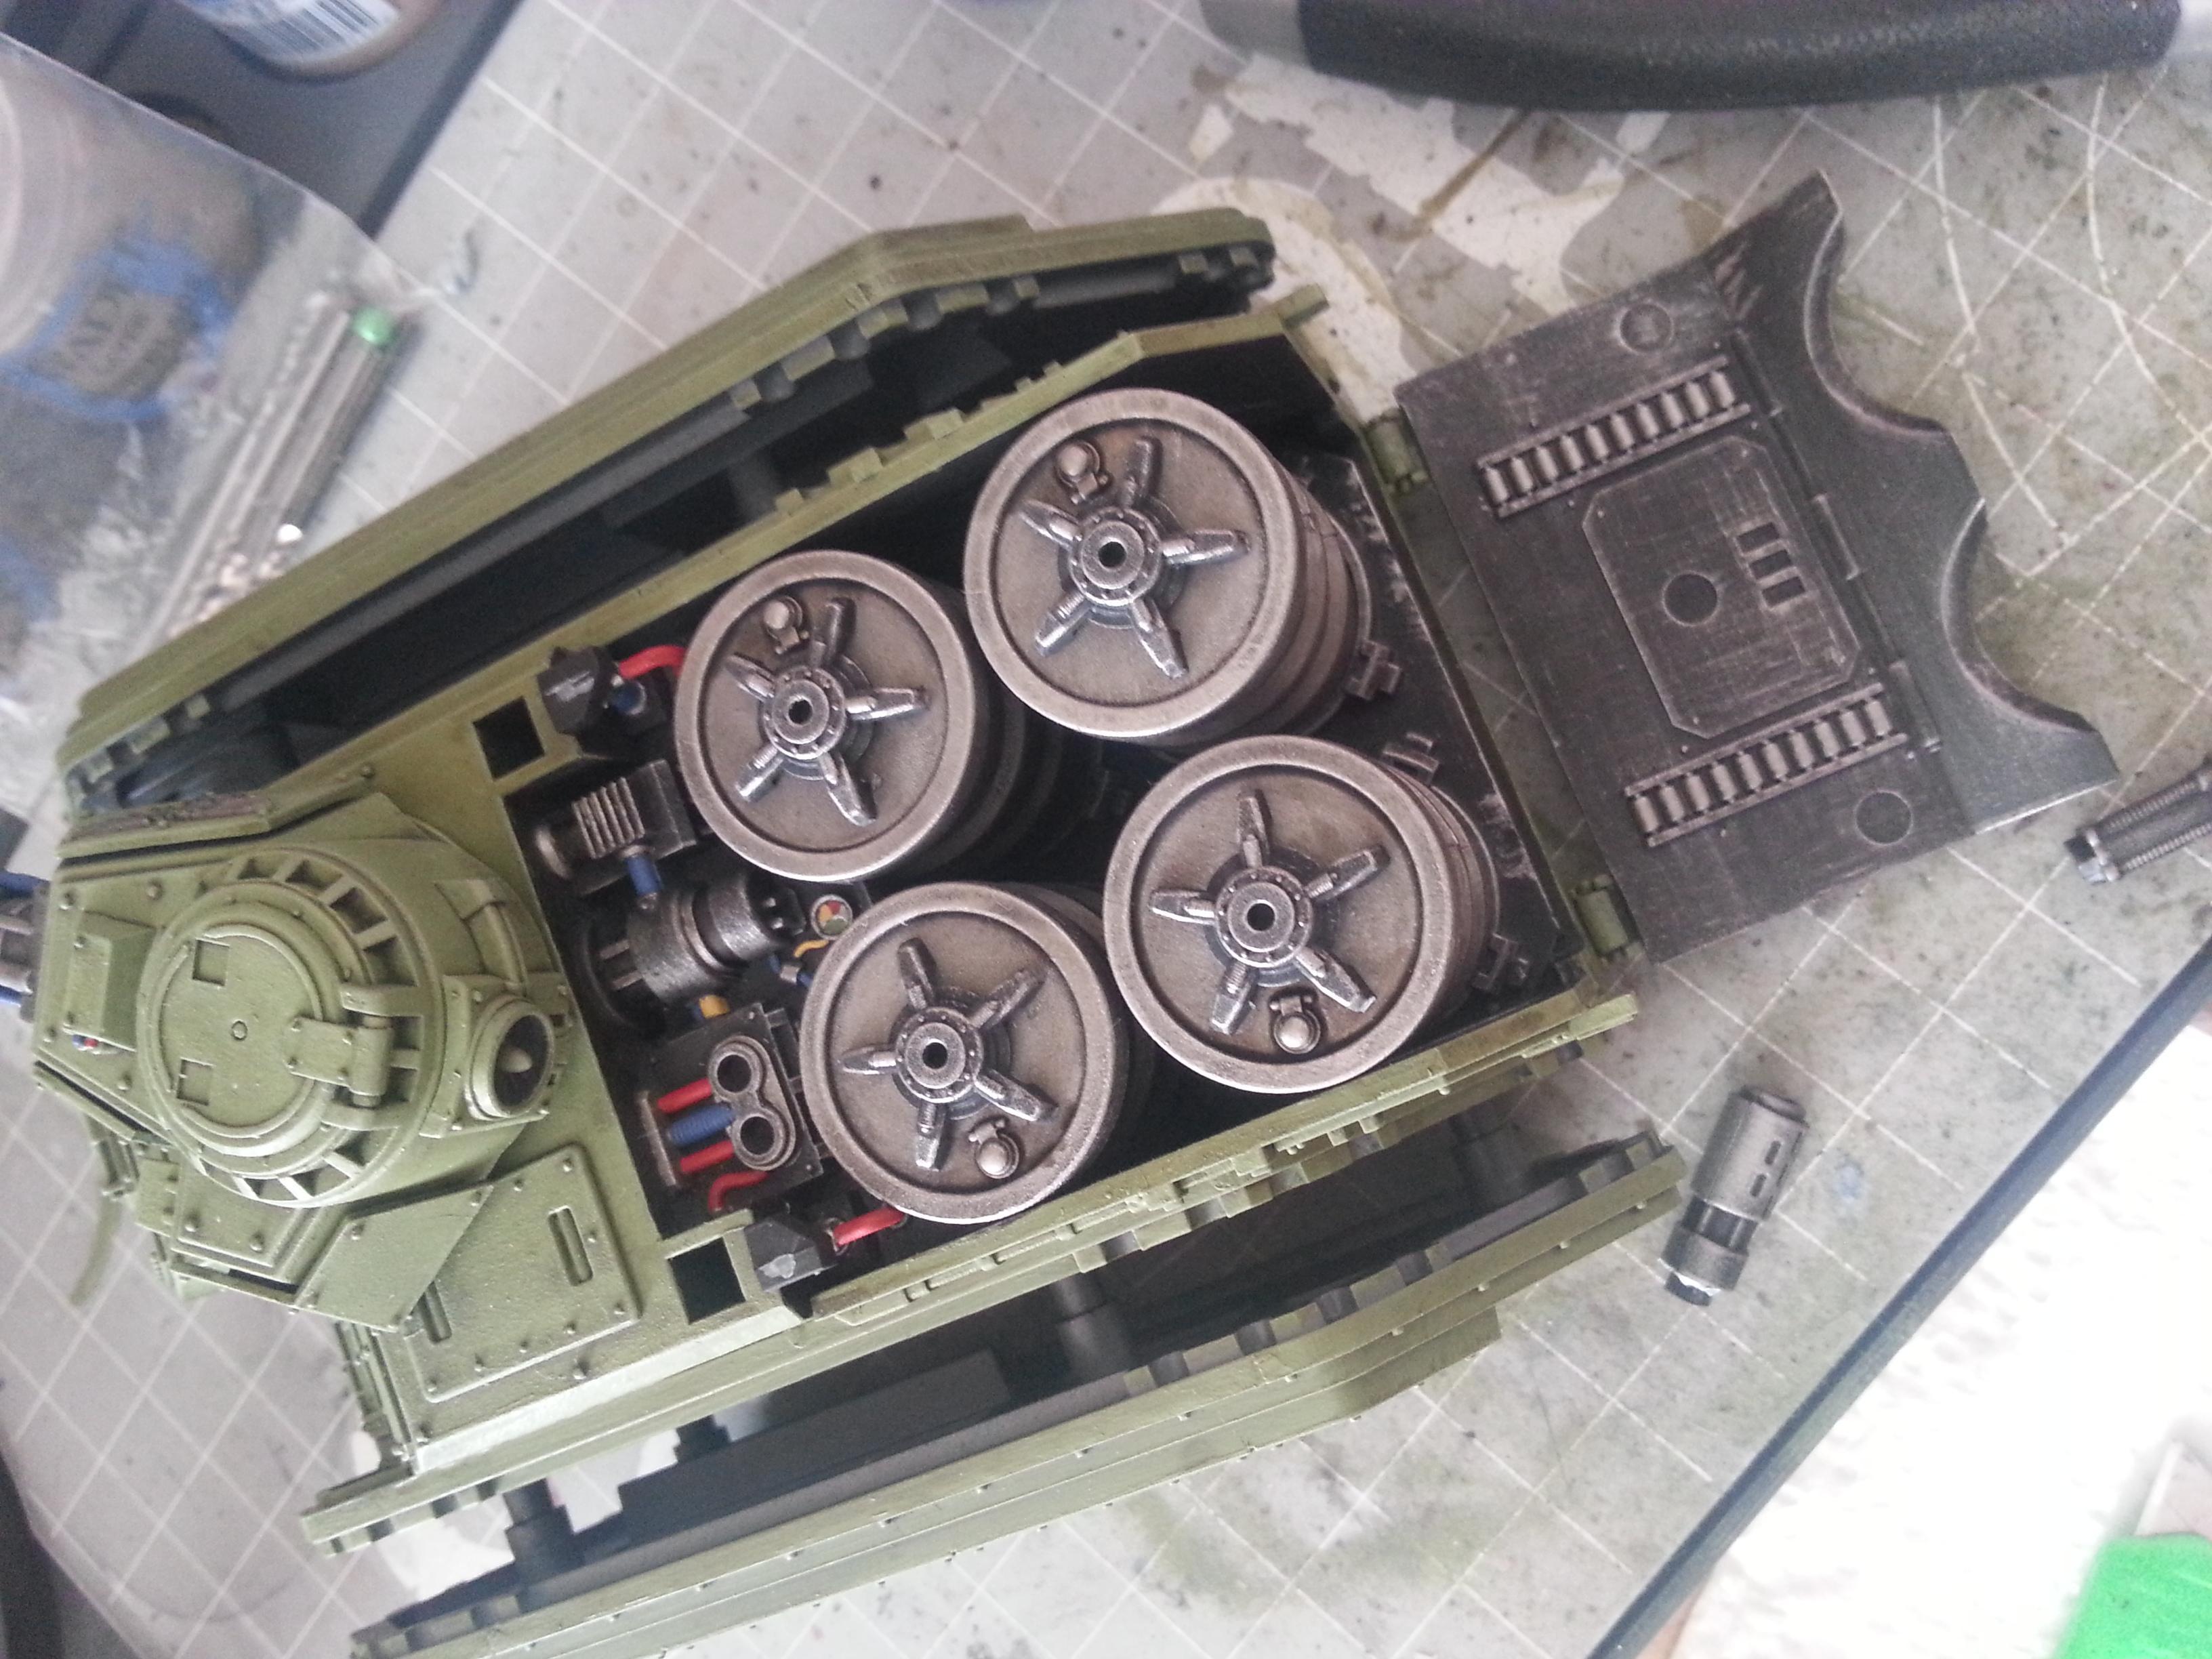 Astra Militarum, Cadians, Hellhound, Imperial Guard